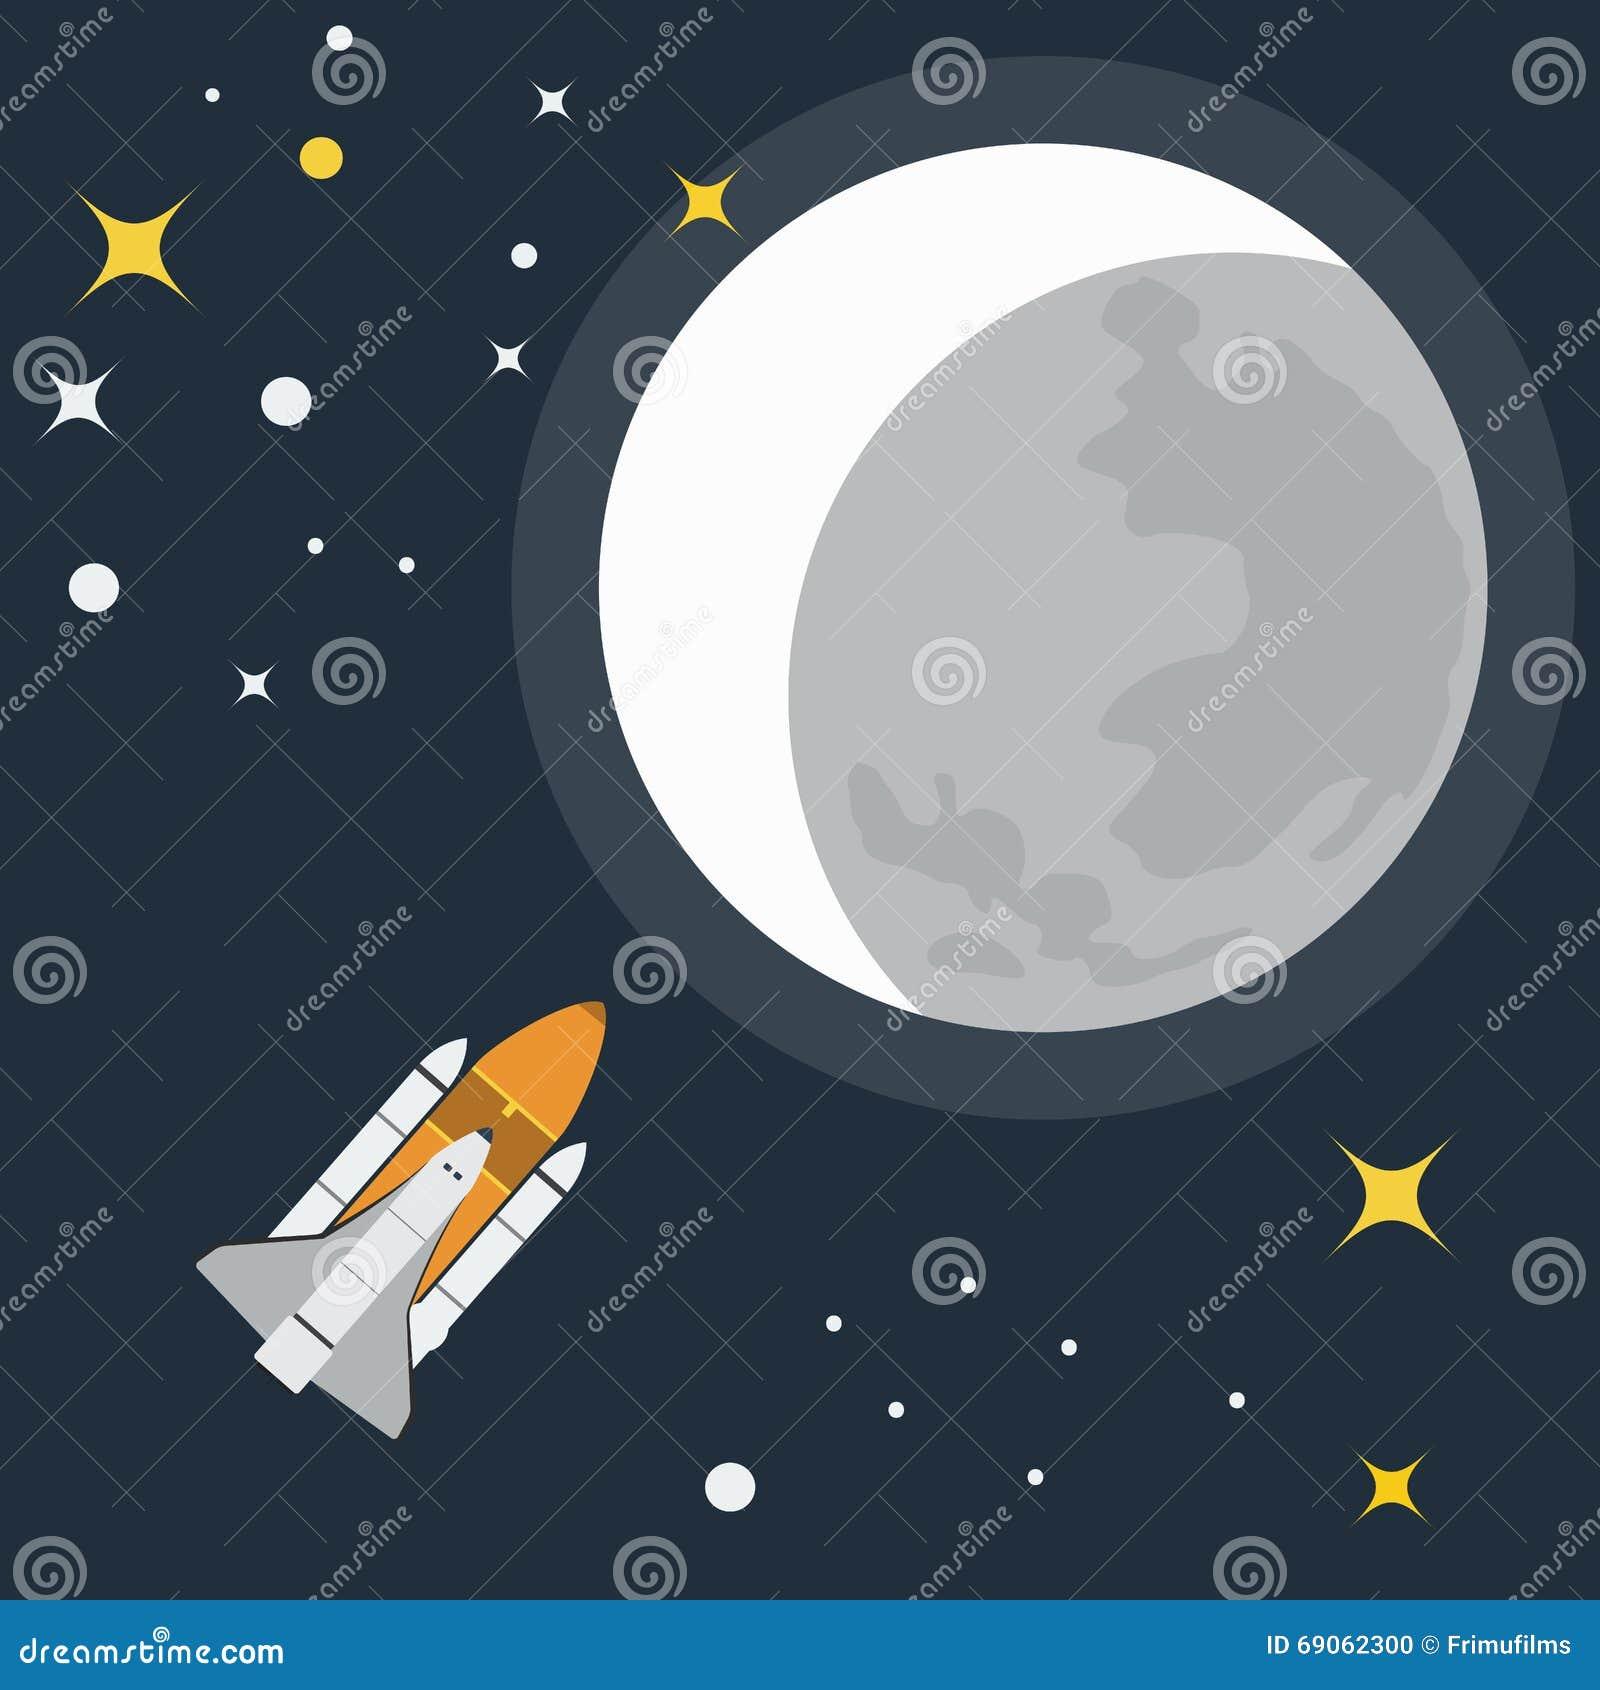 Rockets To The Moon: Rocket Flight To Moon Vector Illustration Stock Vector